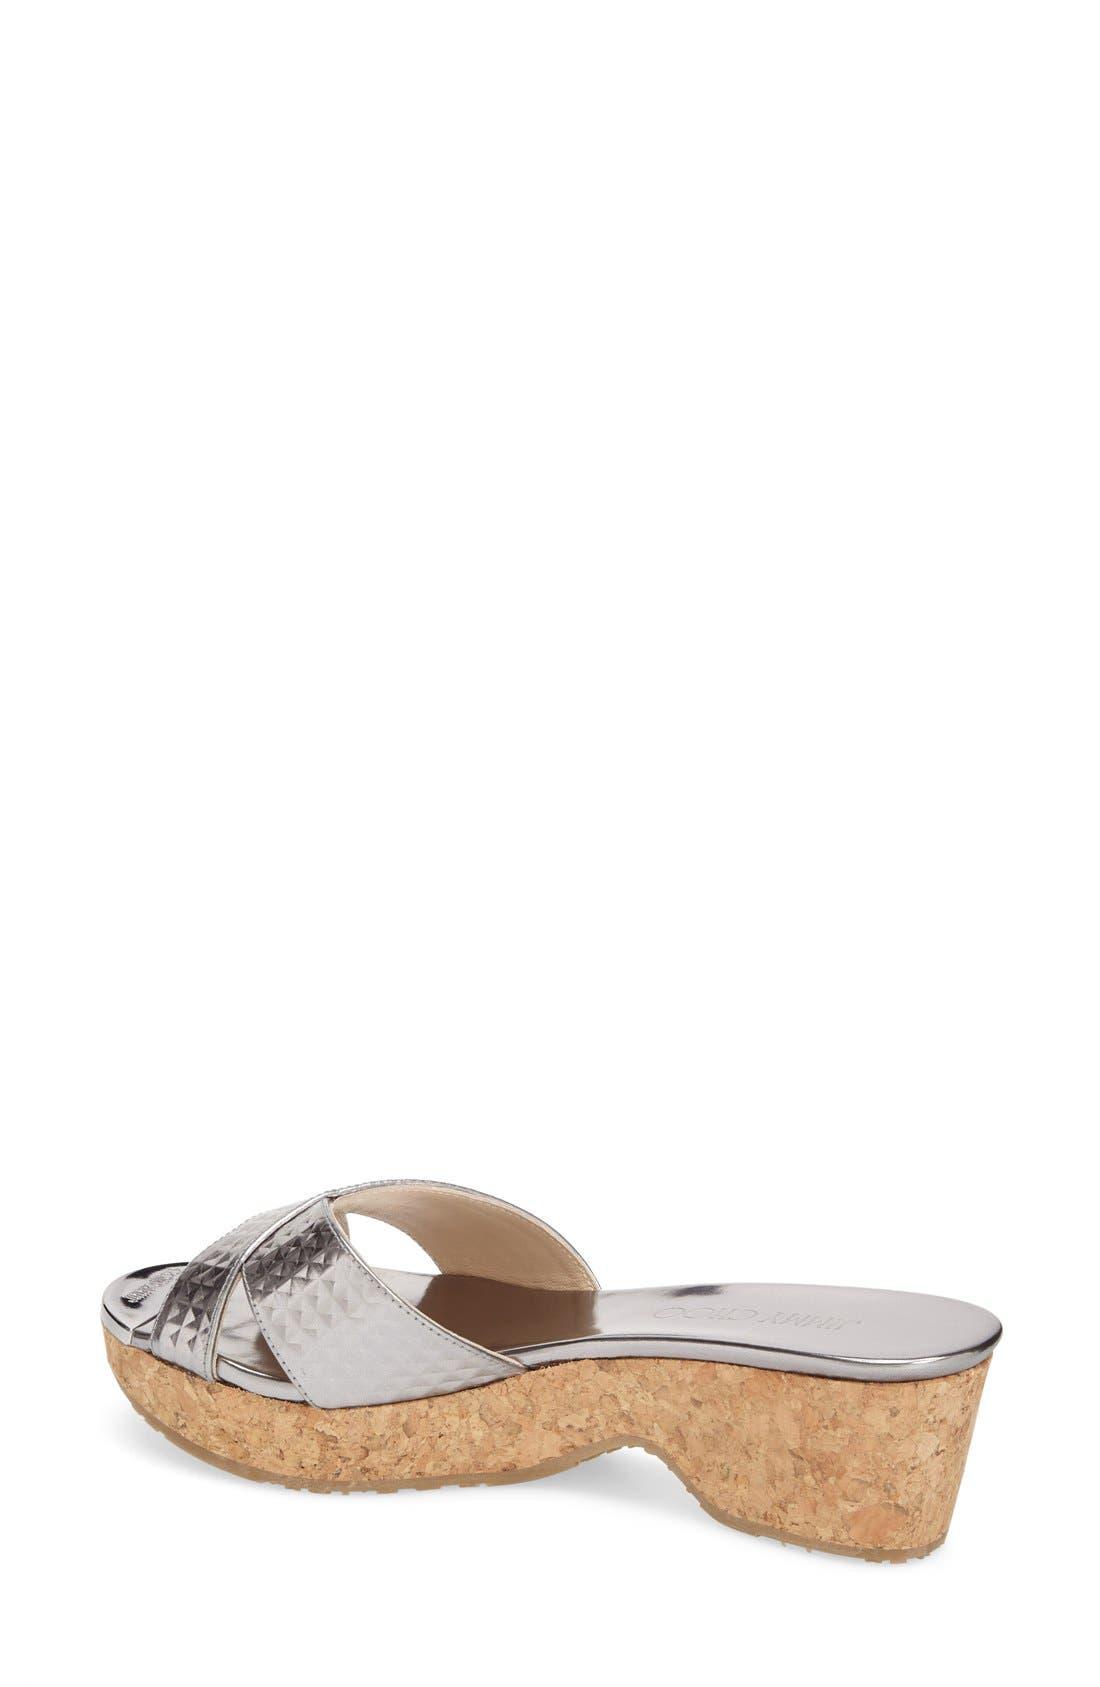 'Panna' Cork Wedge Slide Sandal,                             Alternate thumbnail 4, color,                             040